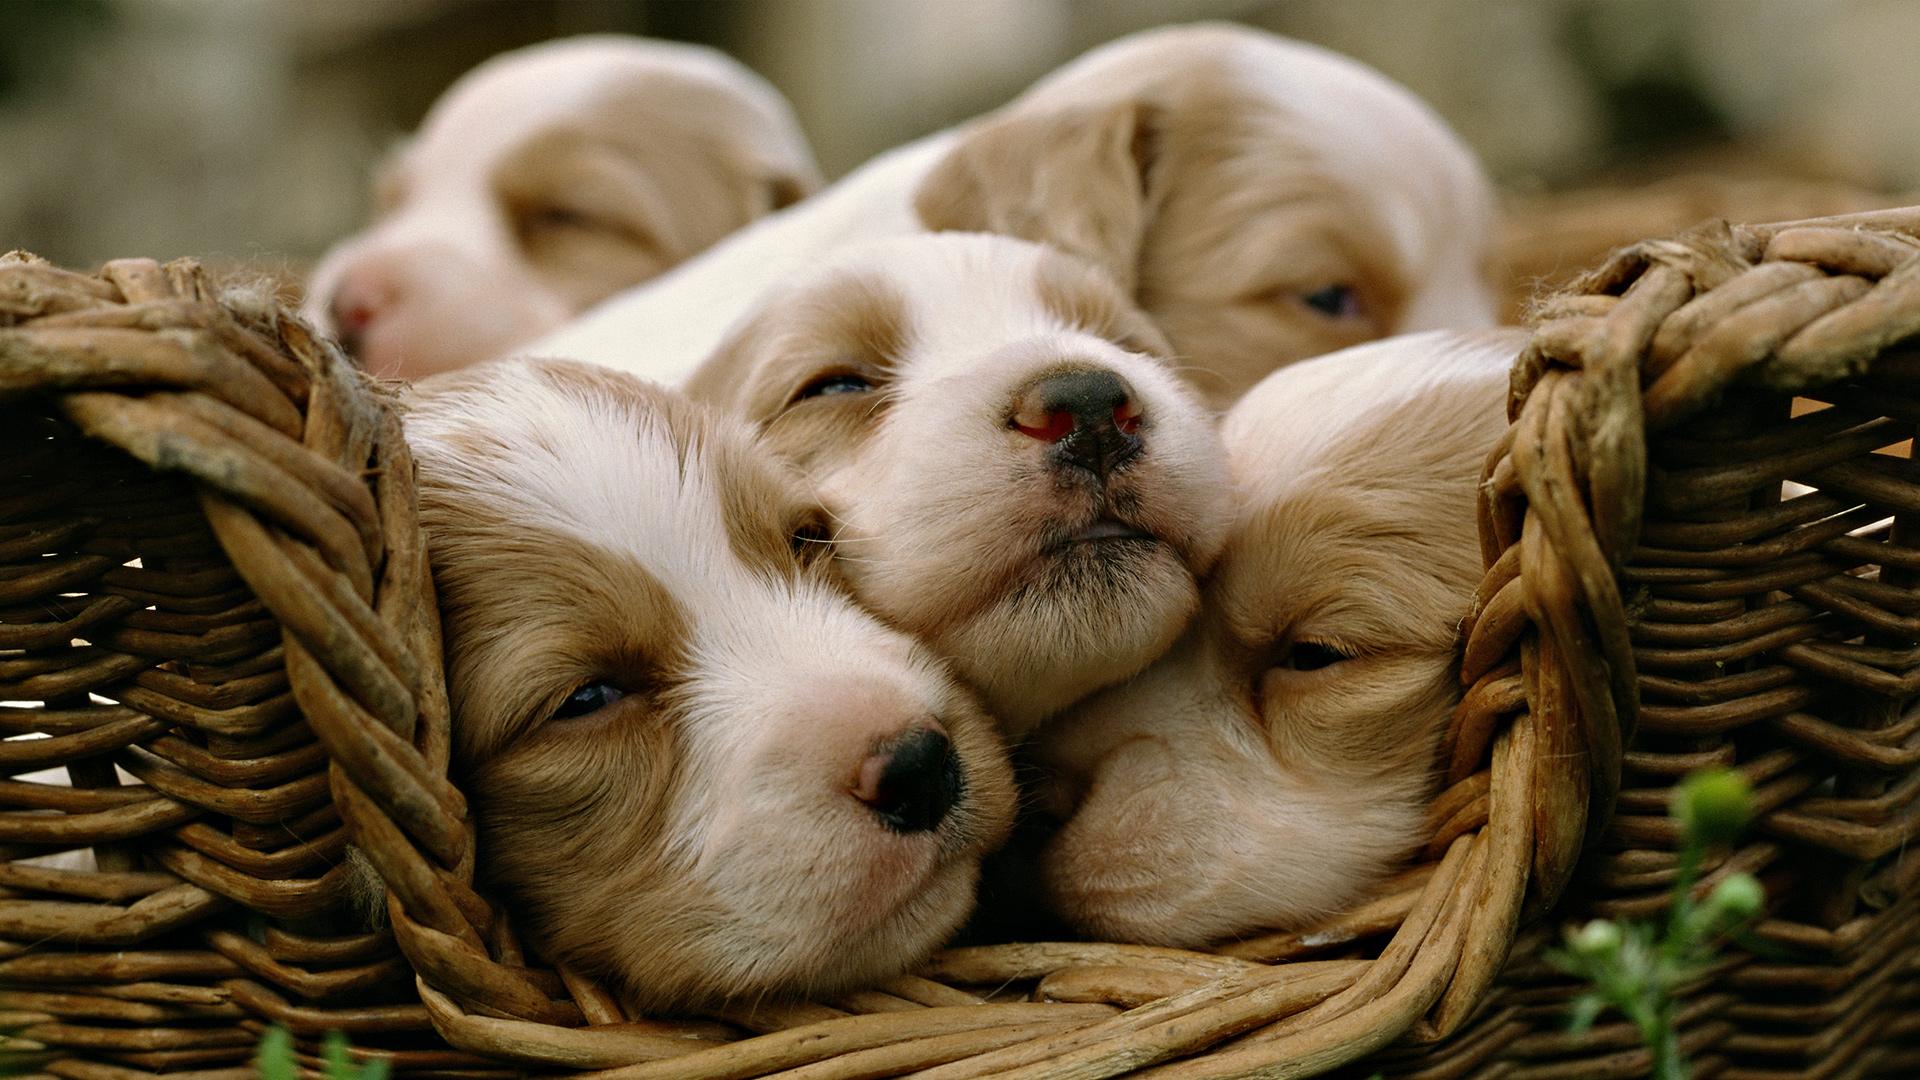 Cute Baby Animal Hd Wallpapers